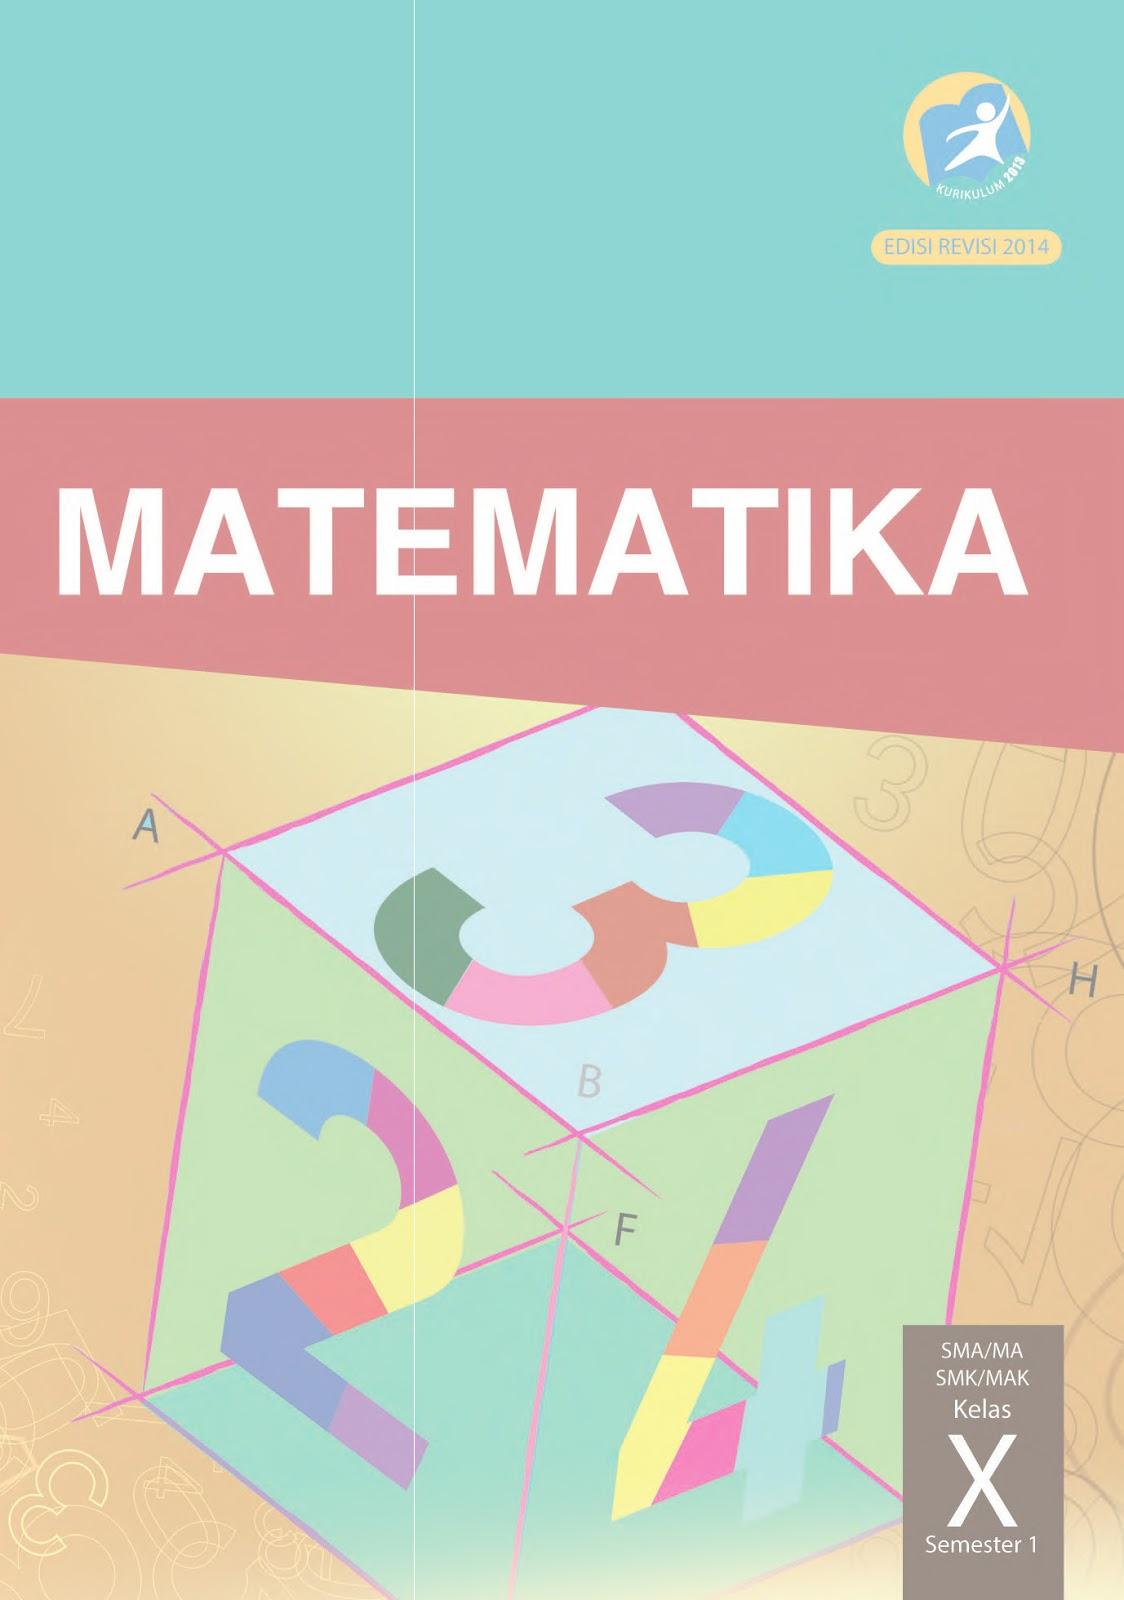 Jawaban Pembahasan Soal Buku Matematika Kurikulum 2013 Sma Kelas X Terampil Matematika Tema